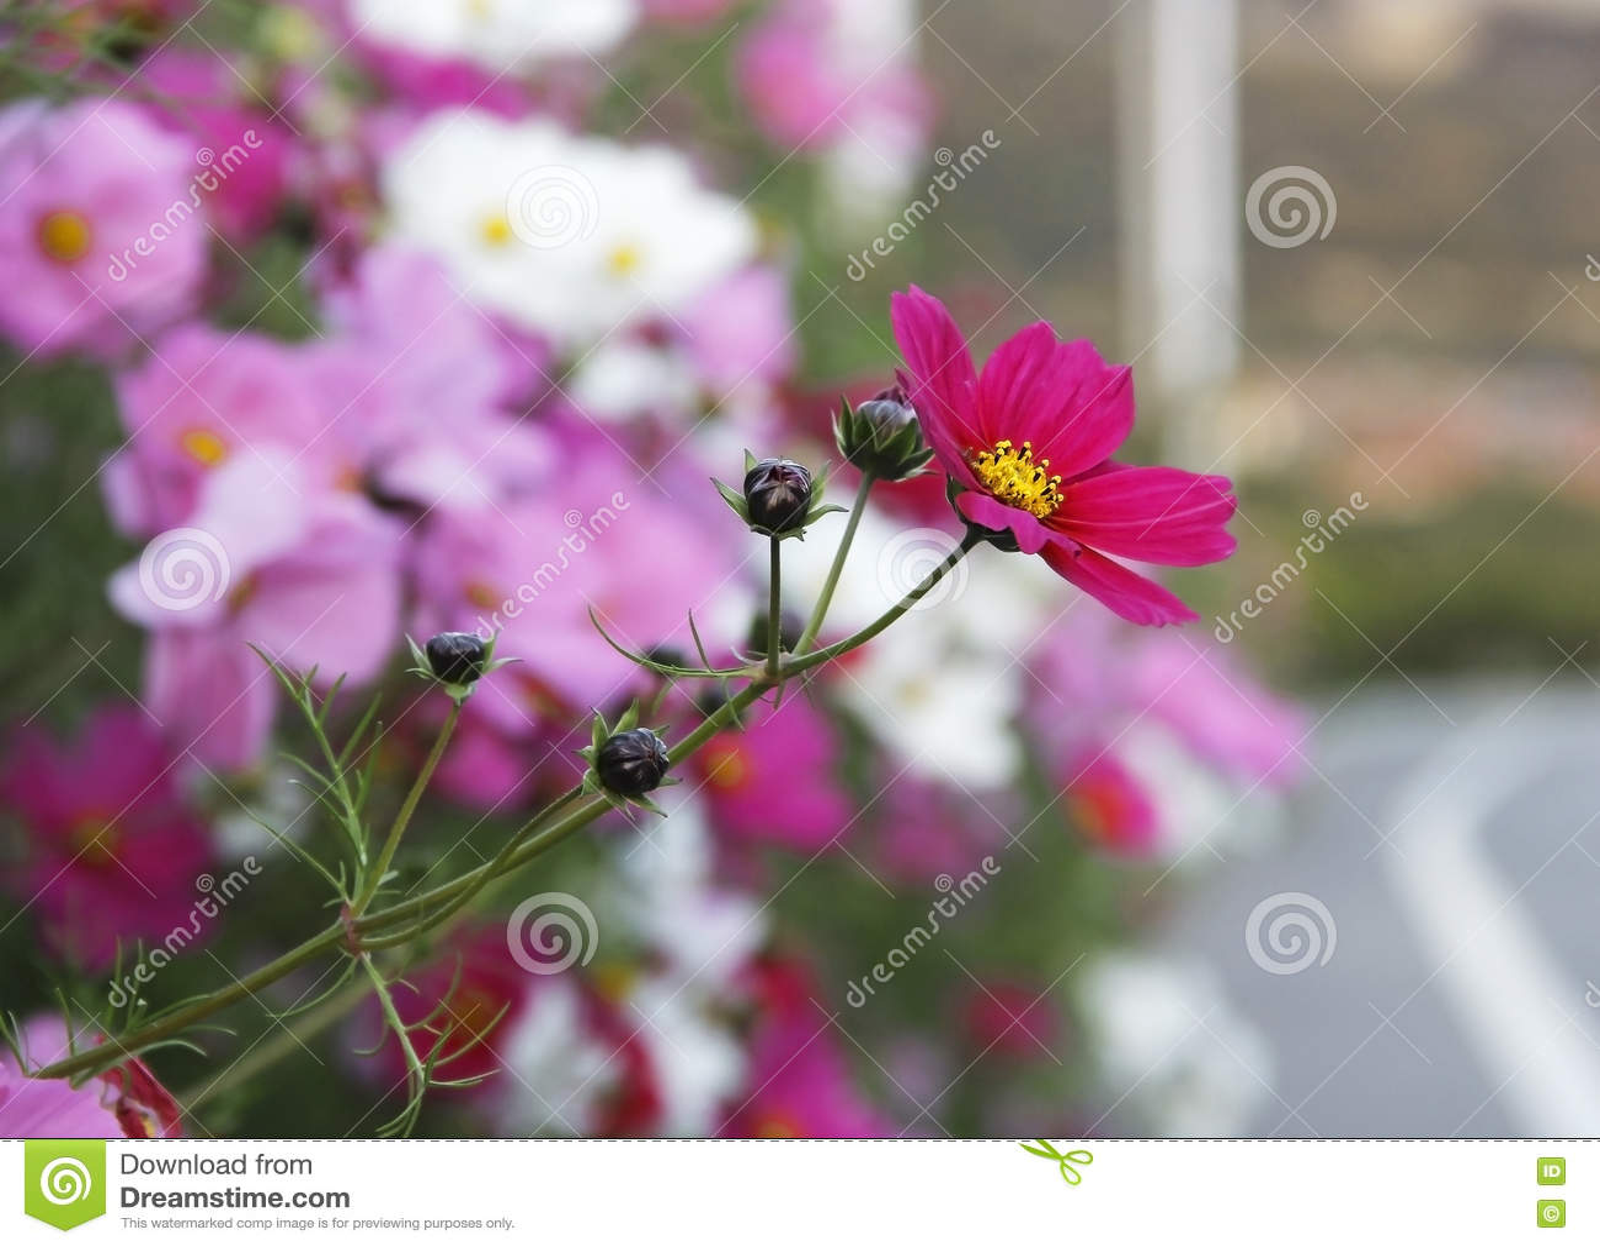 Galsang blomma